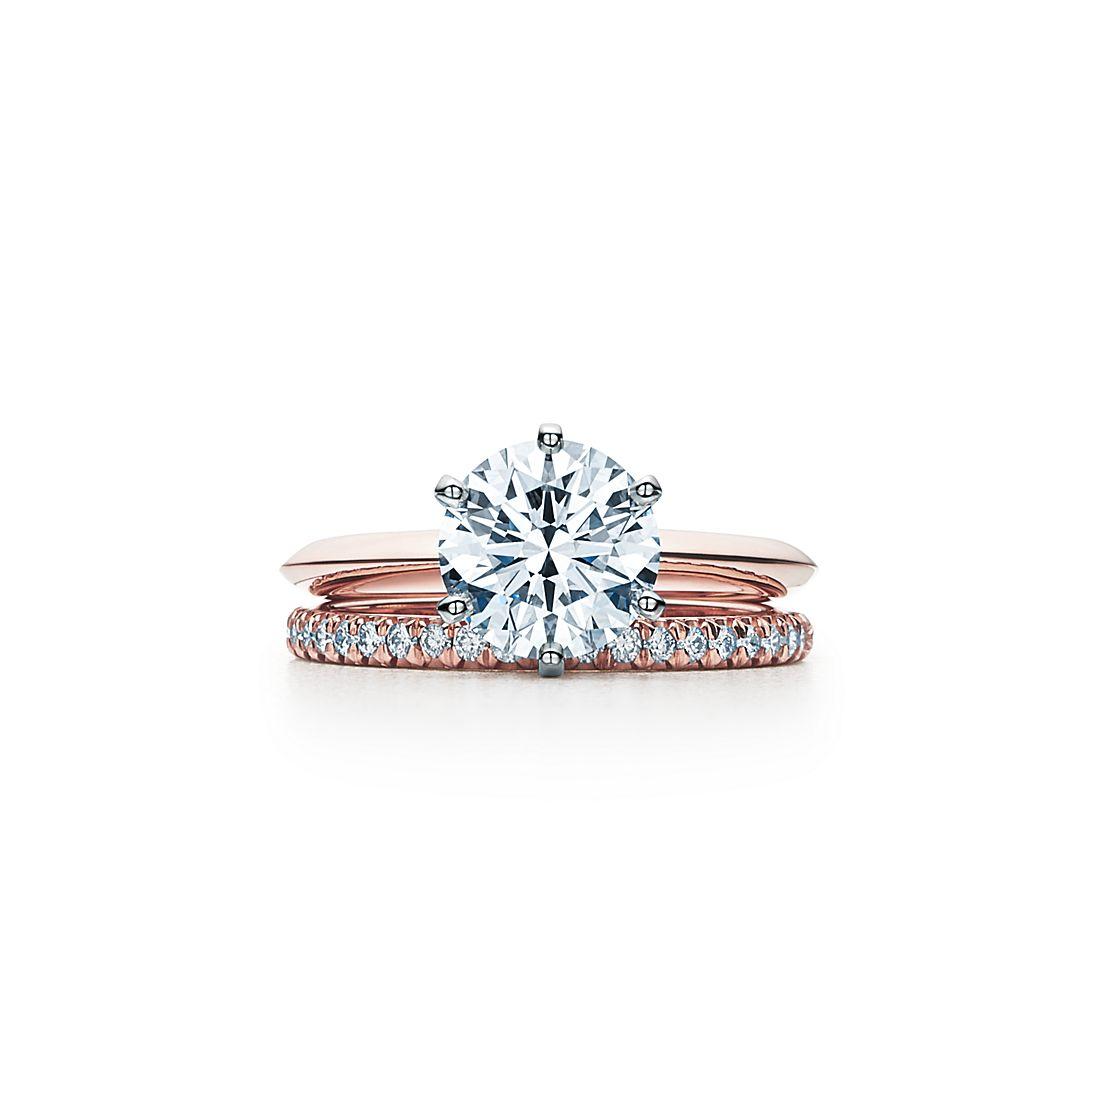 Engagement ring tiffany  The Tiffany® Setting 18K Rose Gold Engagement Rings | Tiffany & Co.